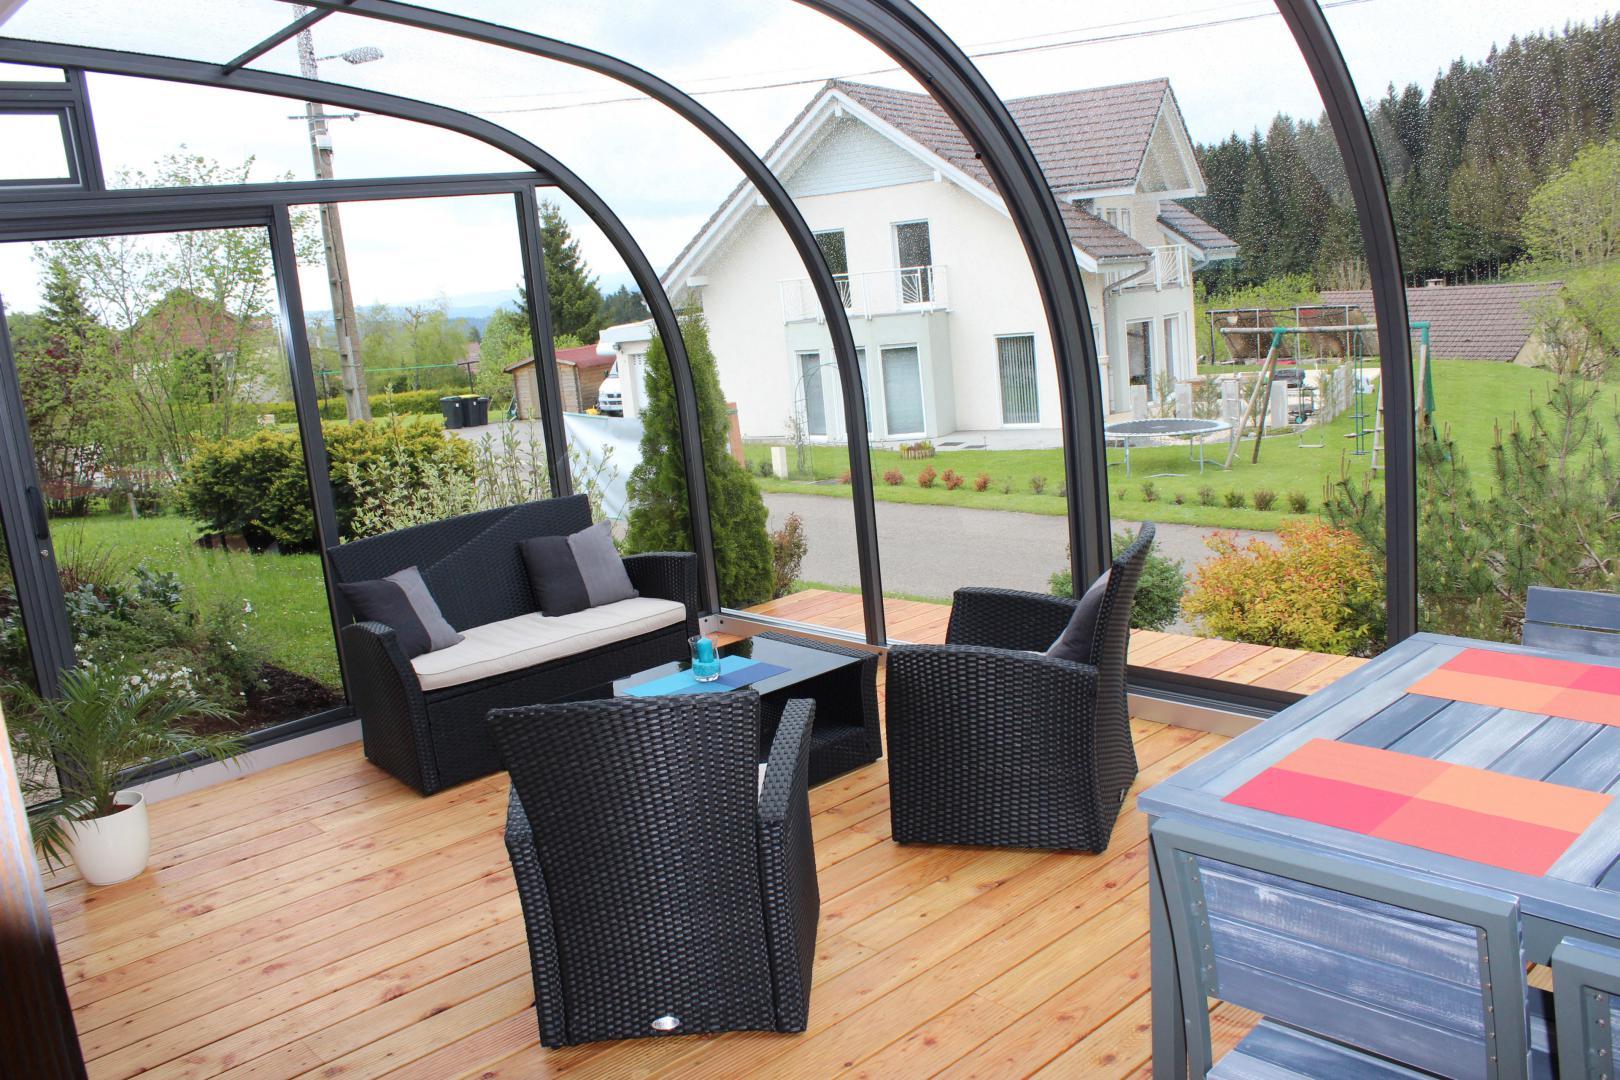 Abri Veranda Pour Spa abris de terrasse 3 saisons de type solar véranda mobile